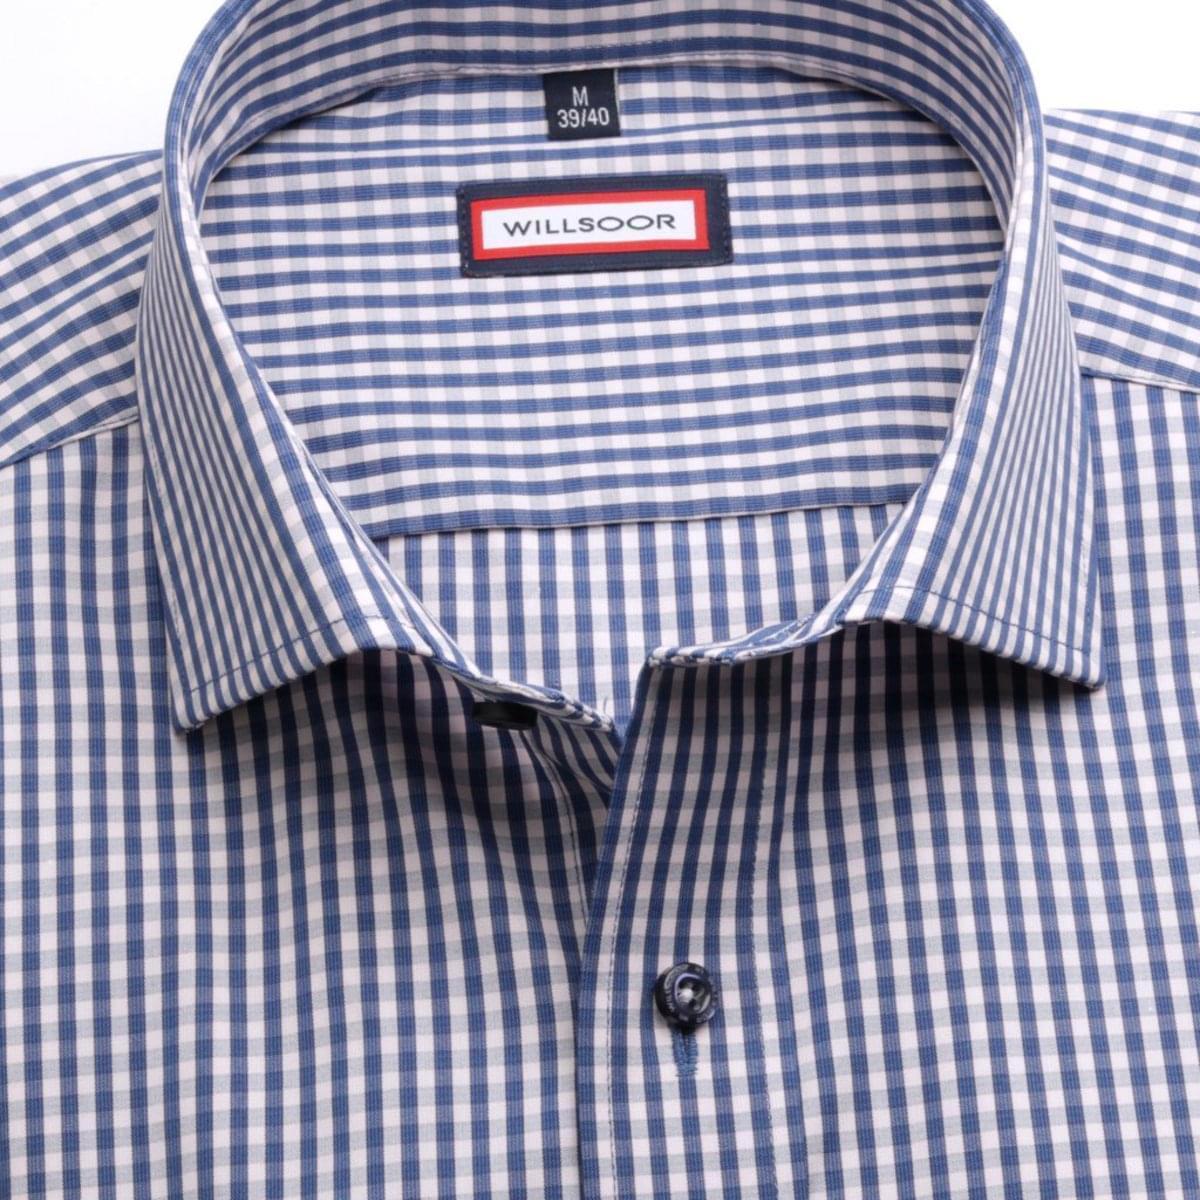 Pánská slim fit košile (výška 176-182) 6723 s kostkou a formulí Easy Care 176-182 / M (39/40)